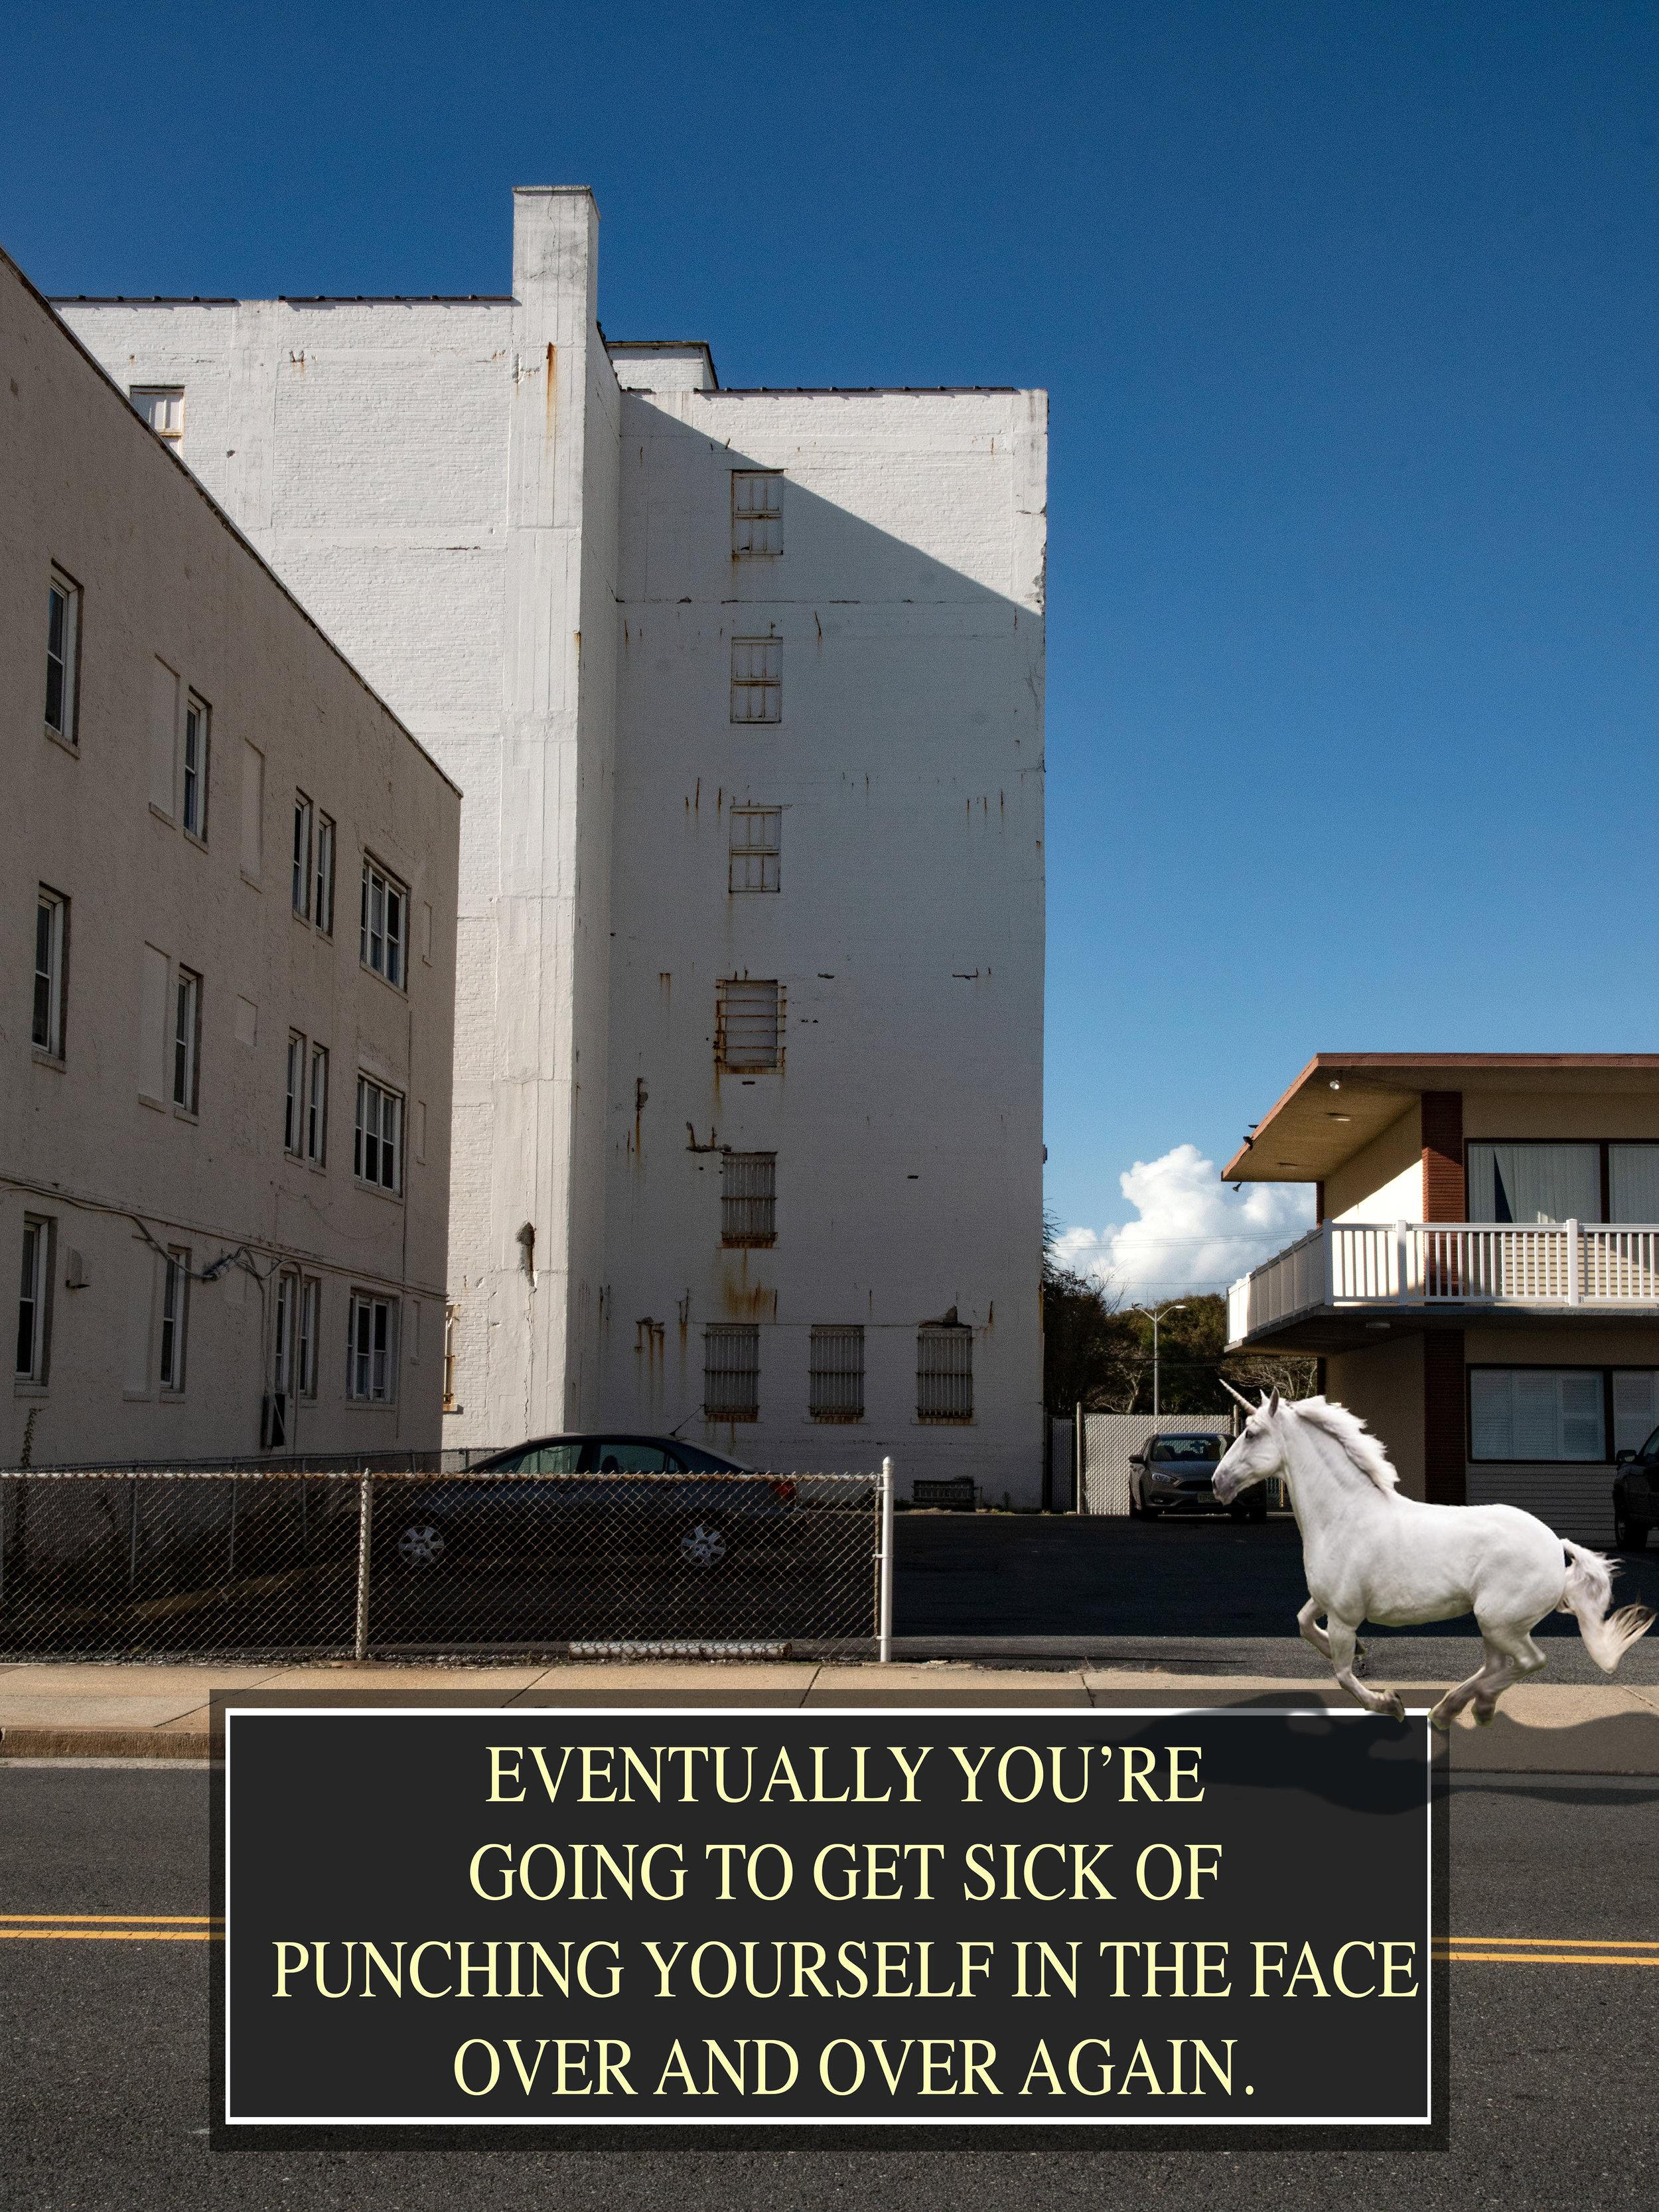 unicorn punches.jpg